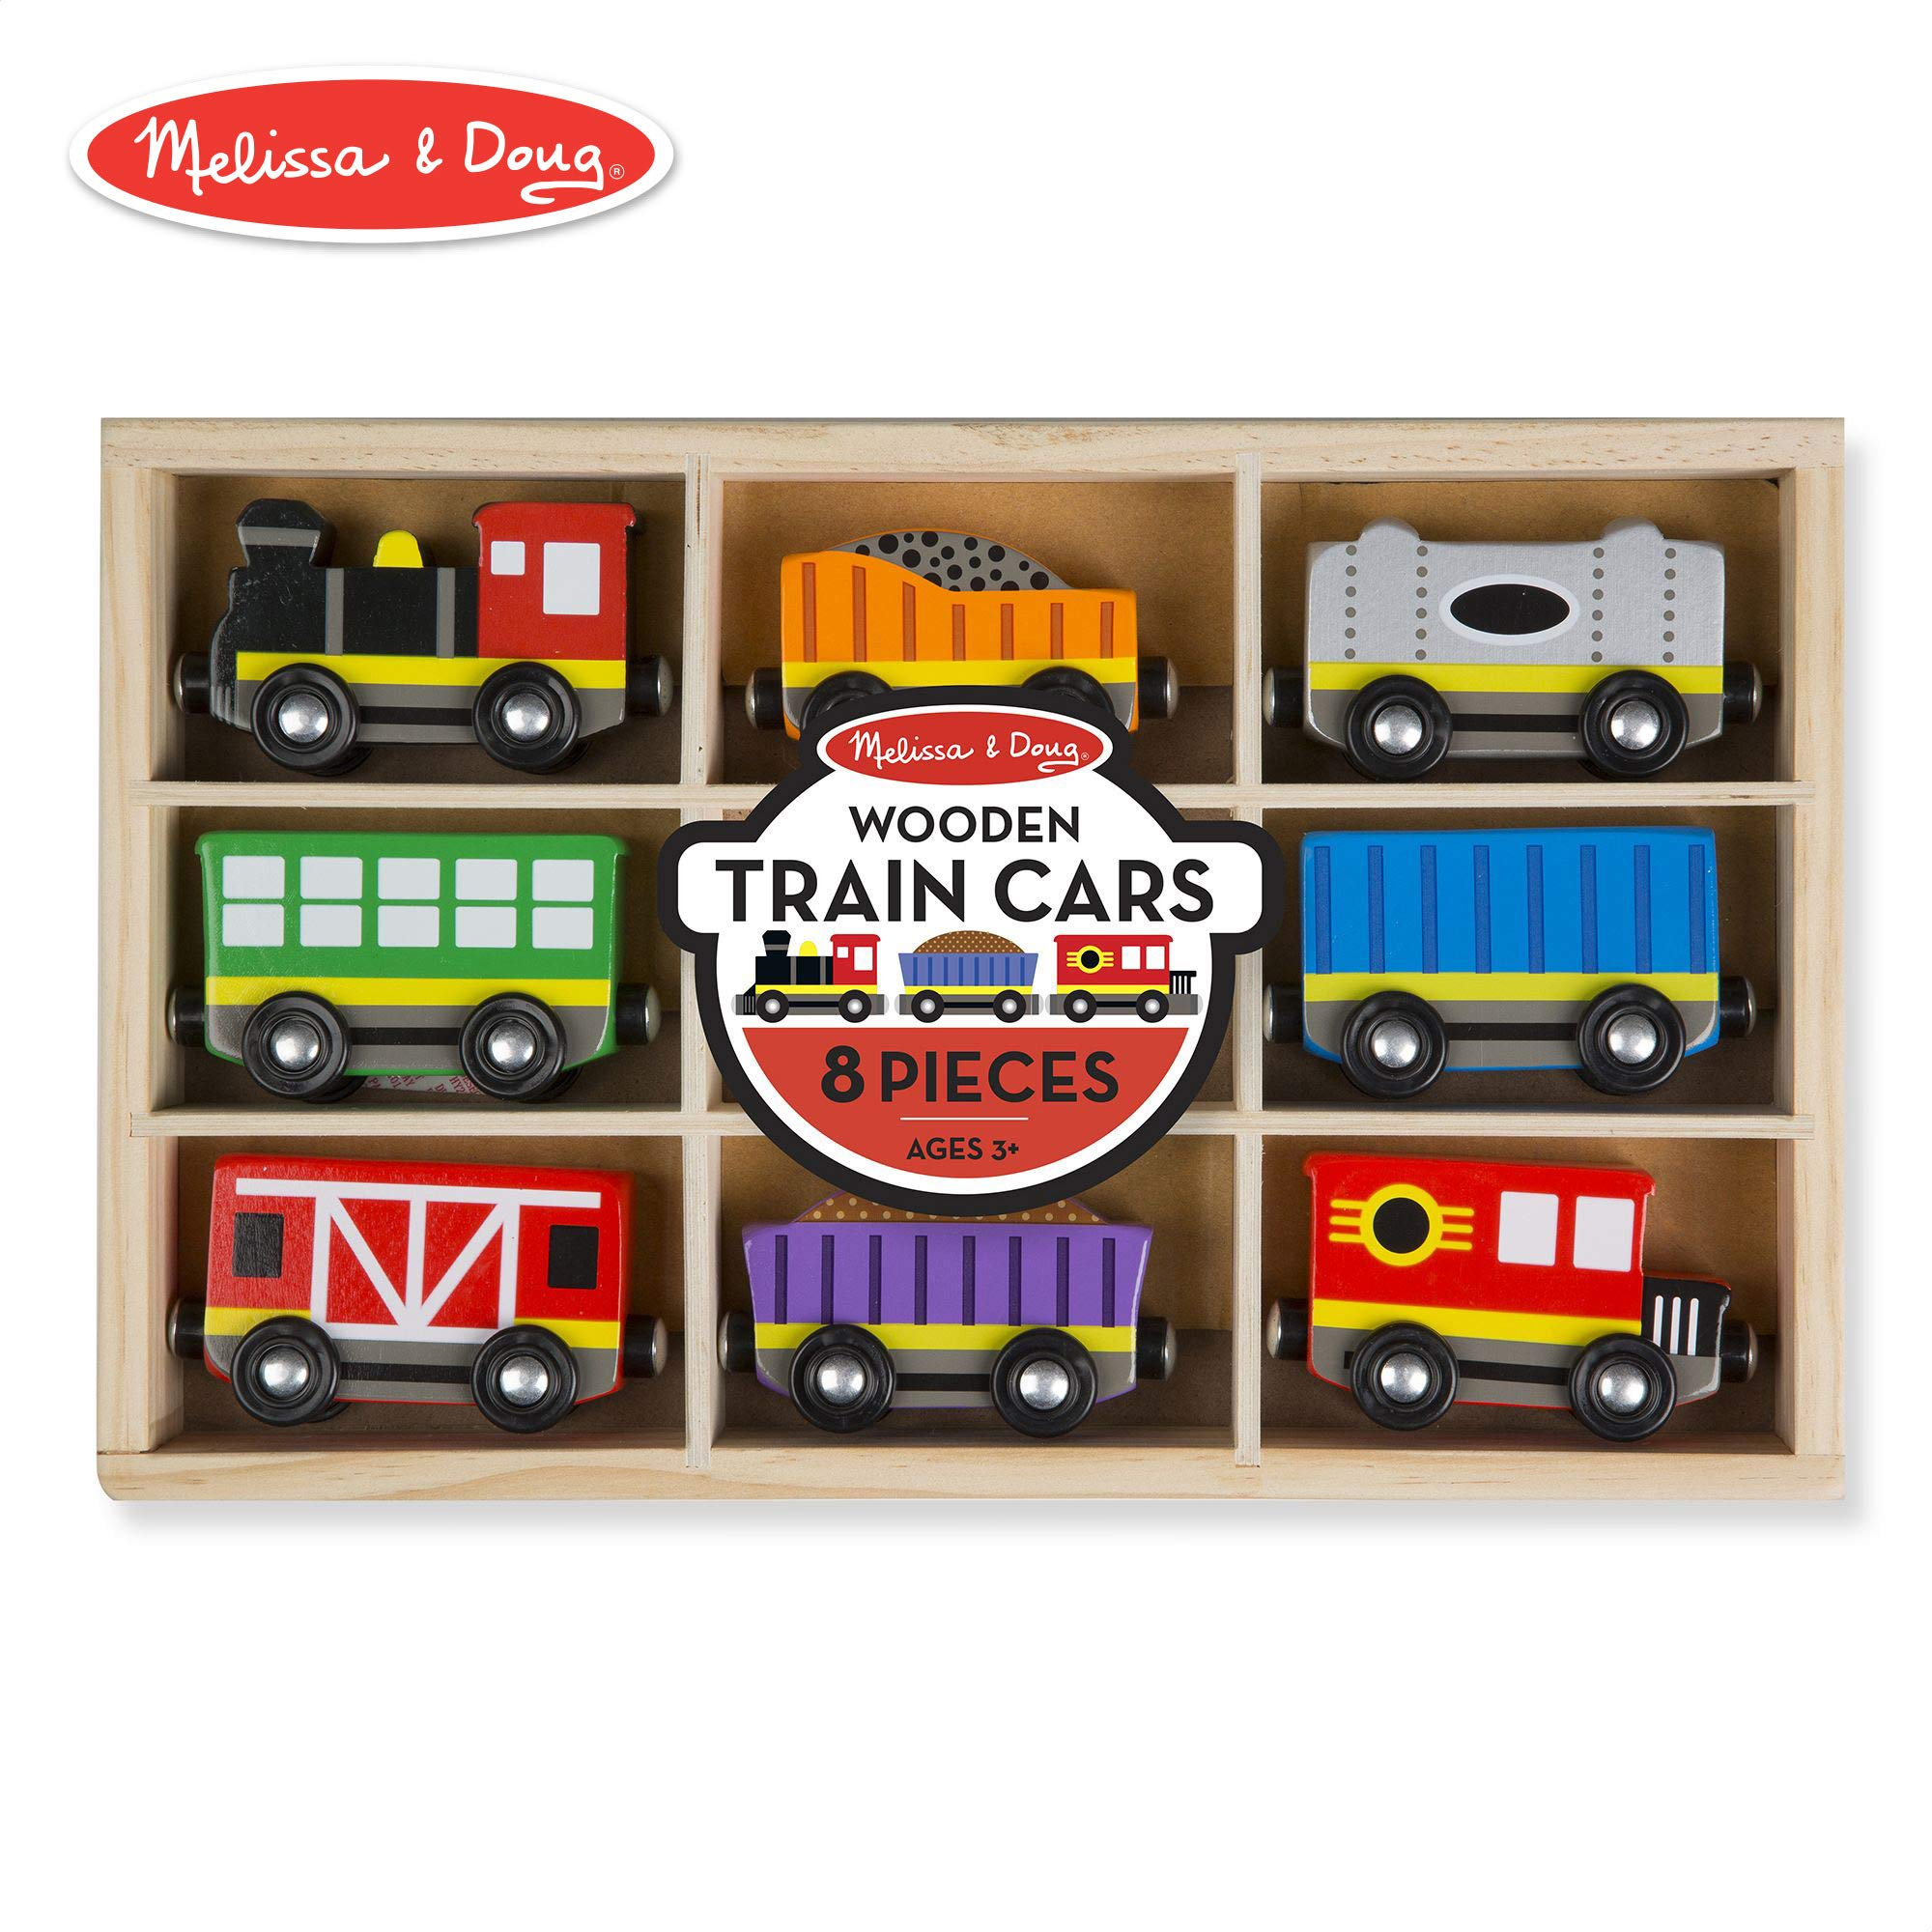 Melissa & Doug Wooden Train Cars (8-Piece Train Set) by Melissa & Doug